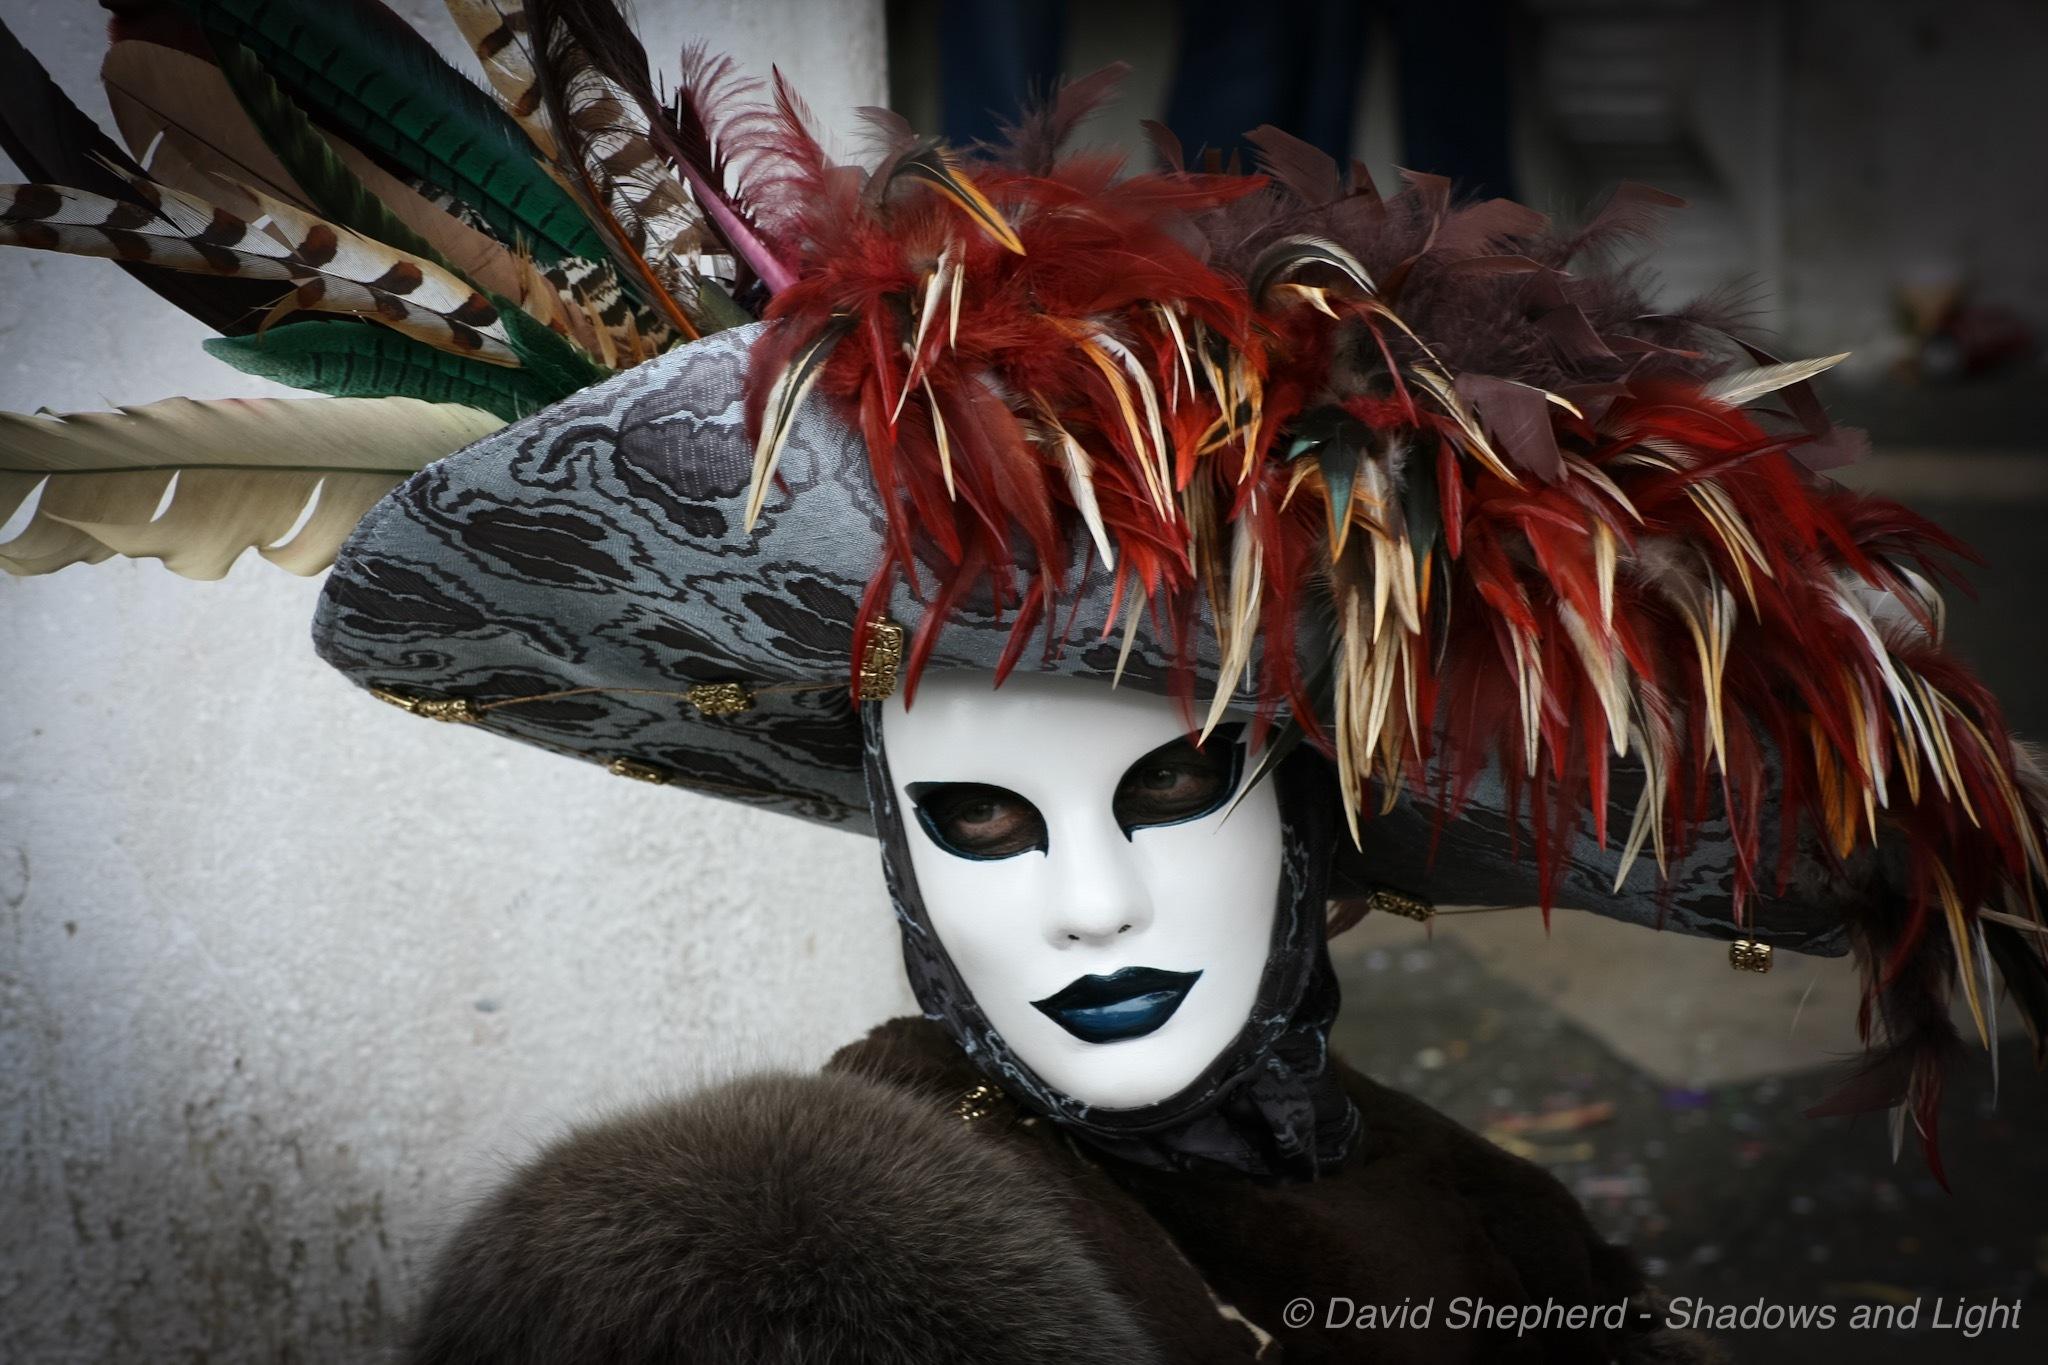 Carnavale de Venezia by David Shepherd - Shadows and Light